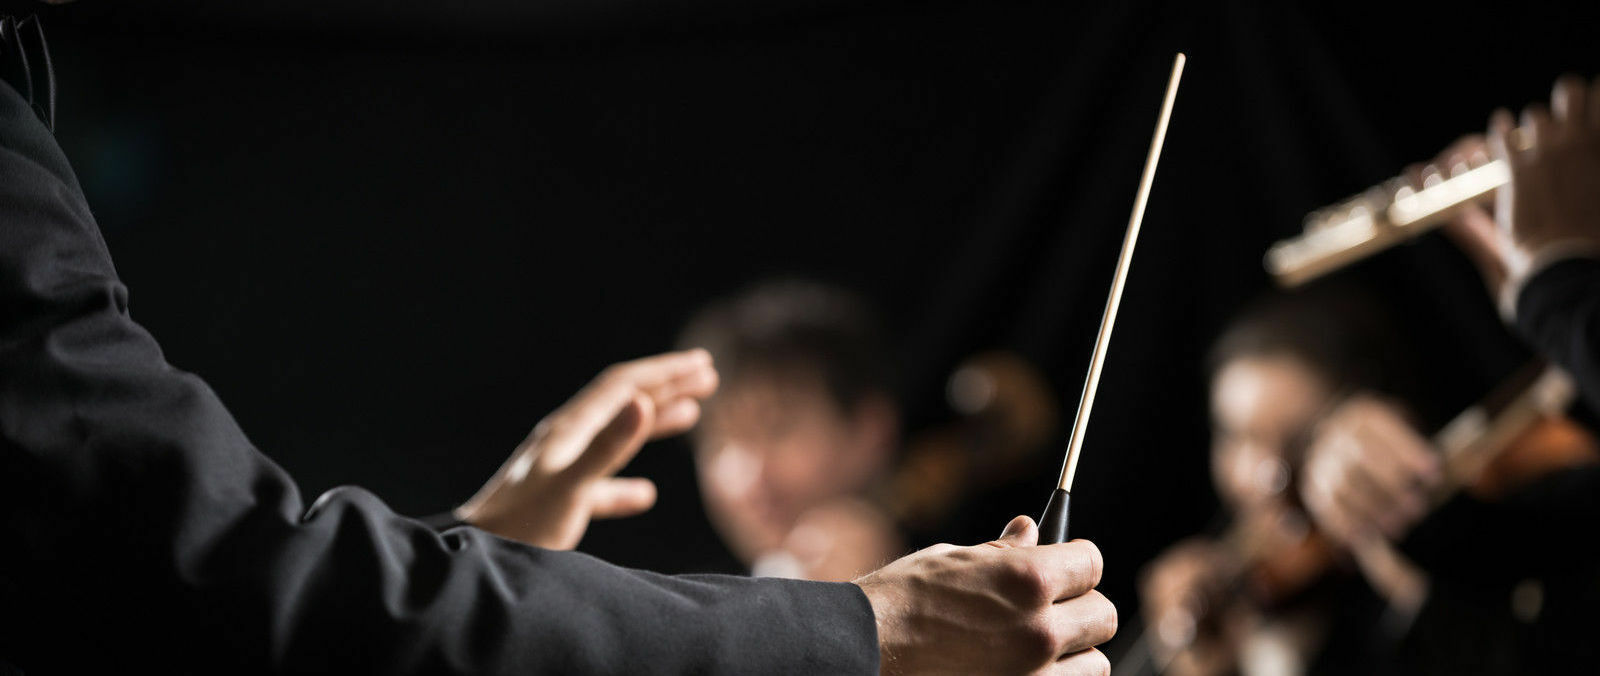 Los Angeles Philharmonic conducted by Gustavo Dudamel Santa Barbara